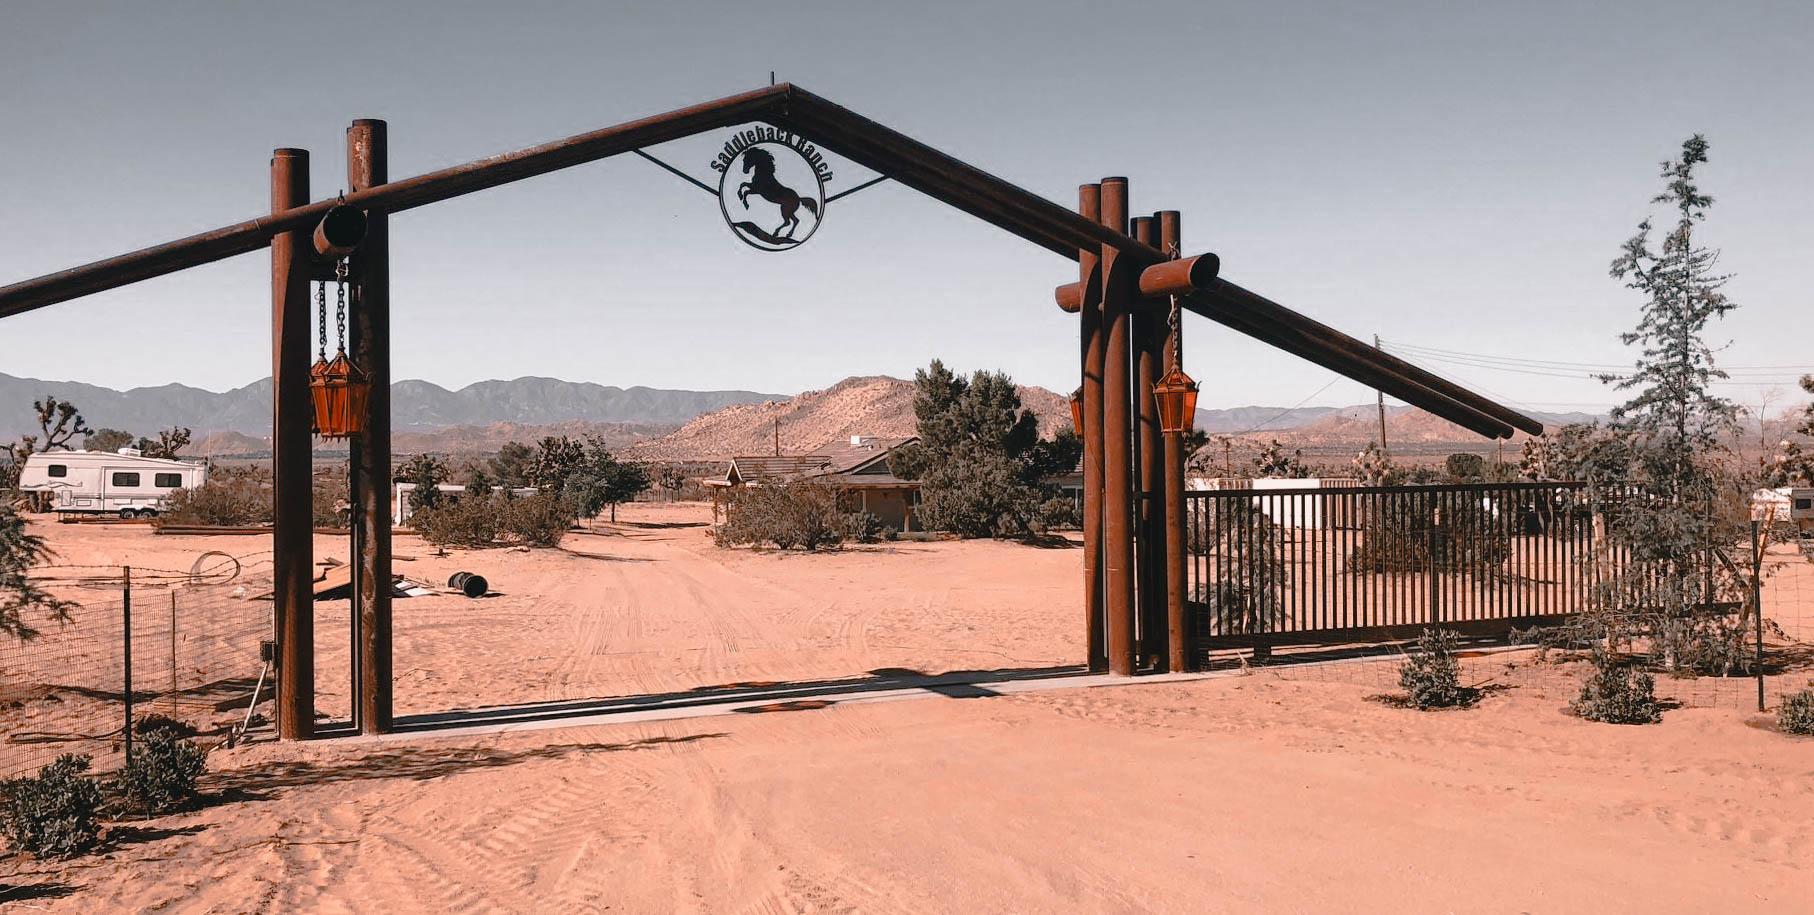 saddlebackranch-1.jpg